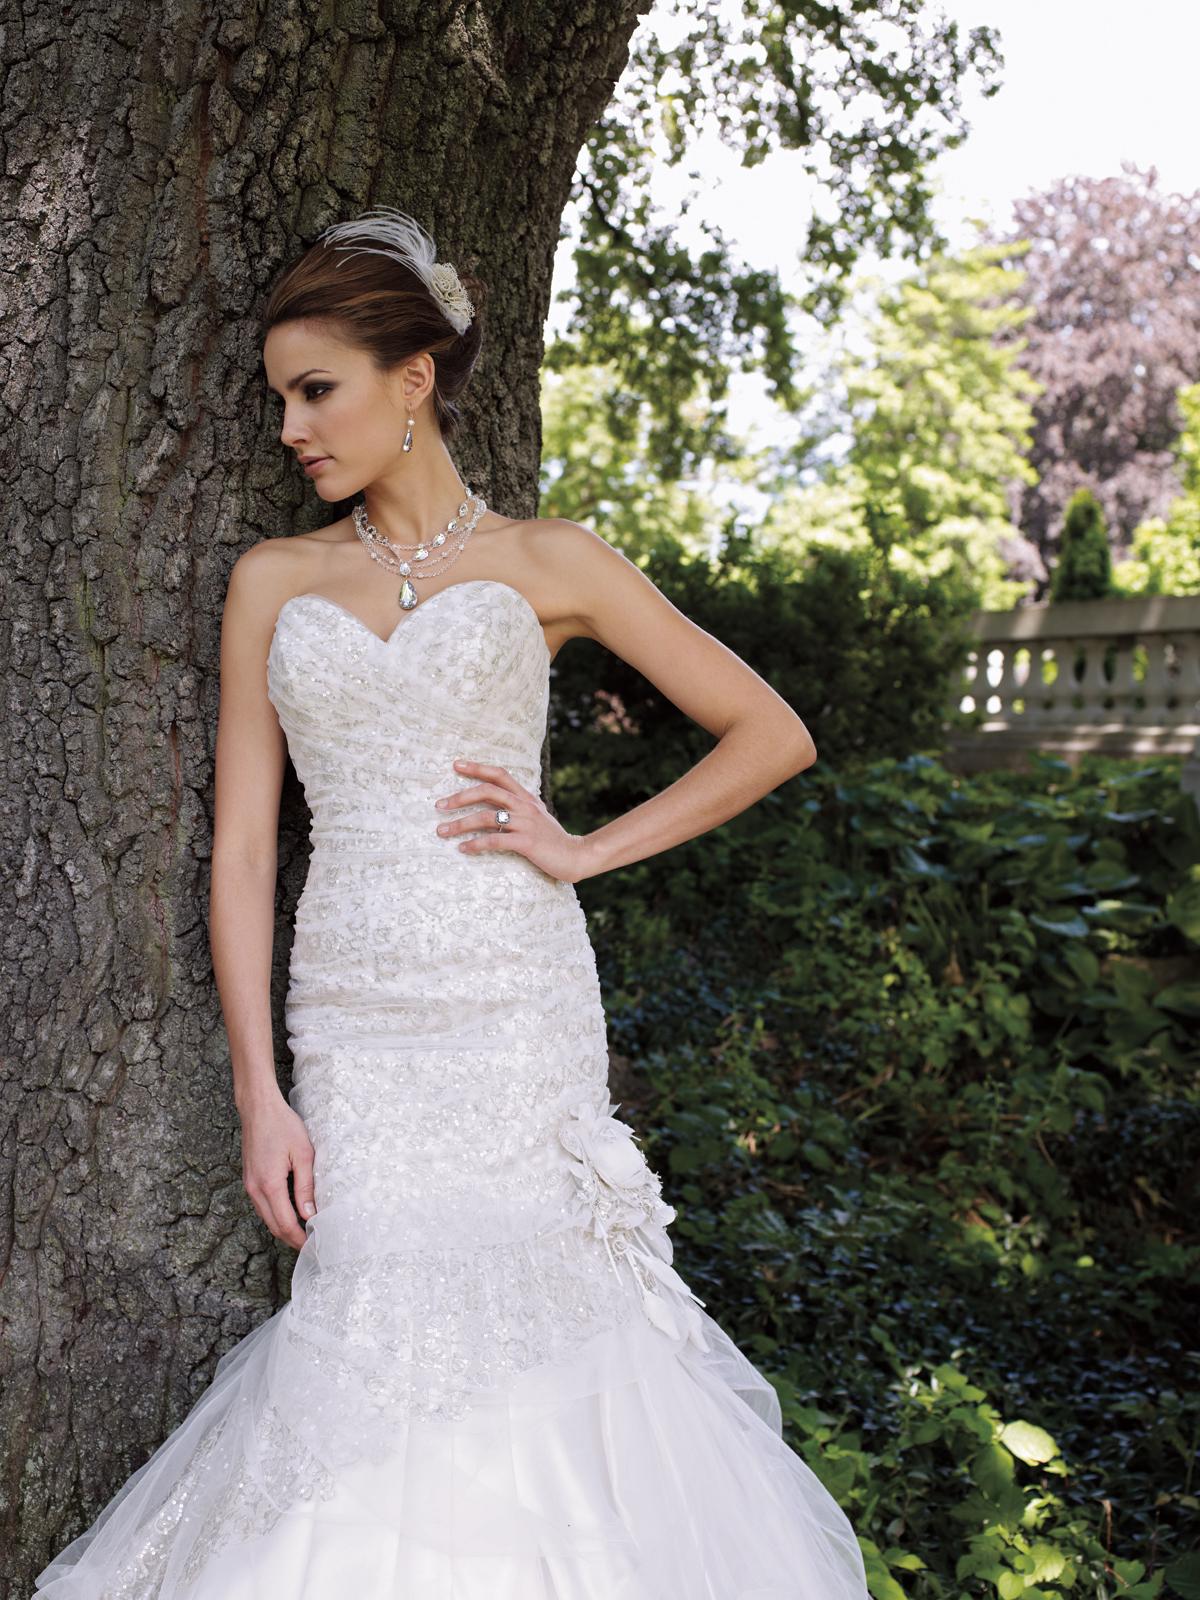 David Tutera Mermaid Wedding Dresses 30 Best David Tutera Gowns Have